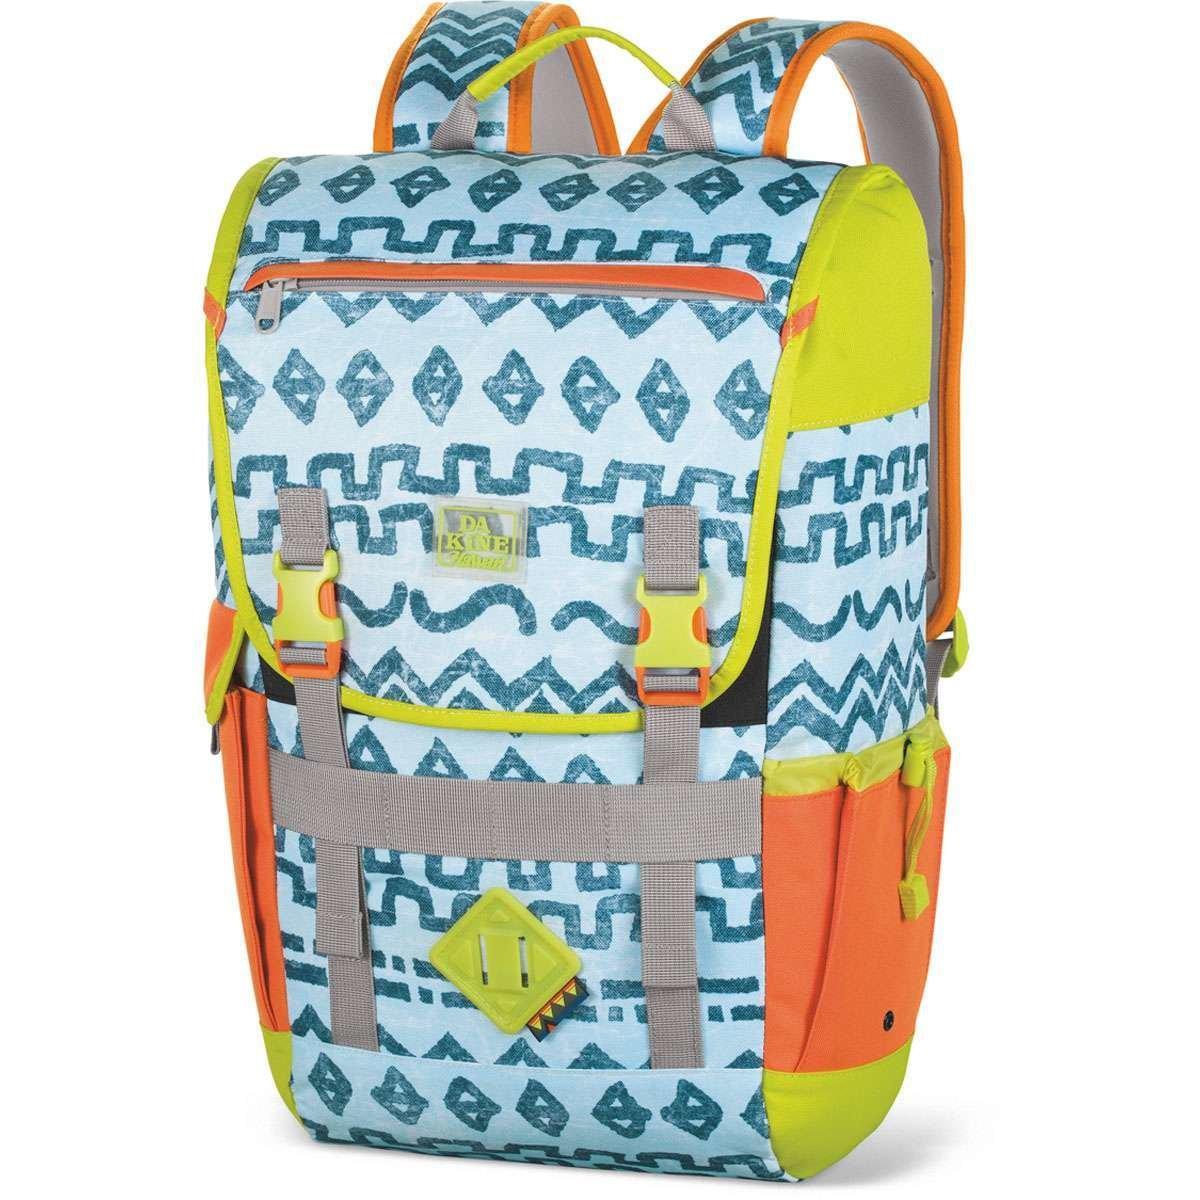 Dakine Ledge Salty Blue & Green 25L Backpack, One Size fits all